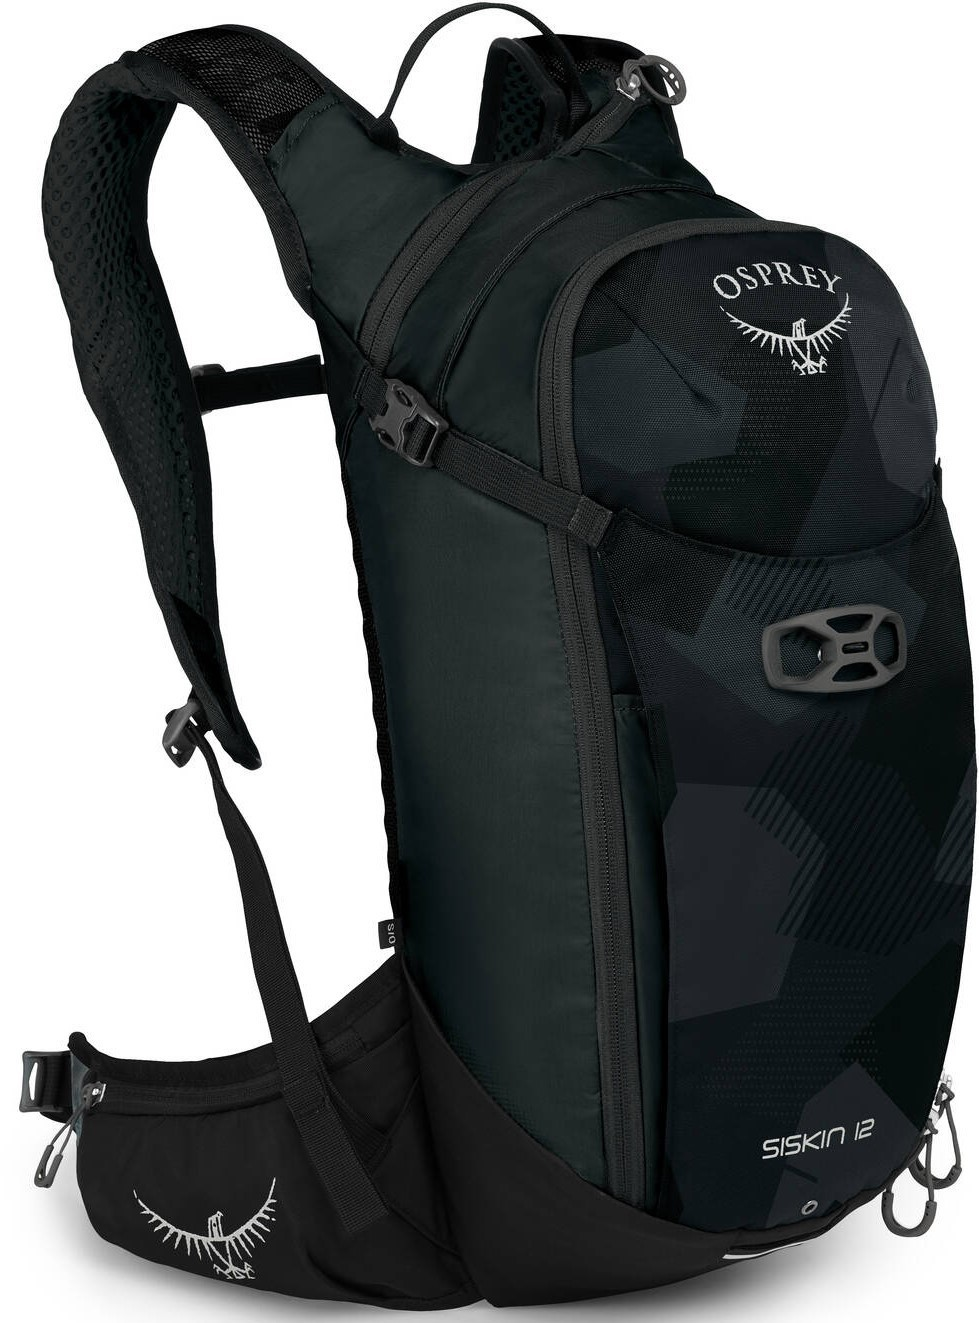 Escapist Рюкзак велосипедный Osprey Siskin 12 Obsidian Black Siskin_12_S19_Side_Obsidian_Black_web.jpg